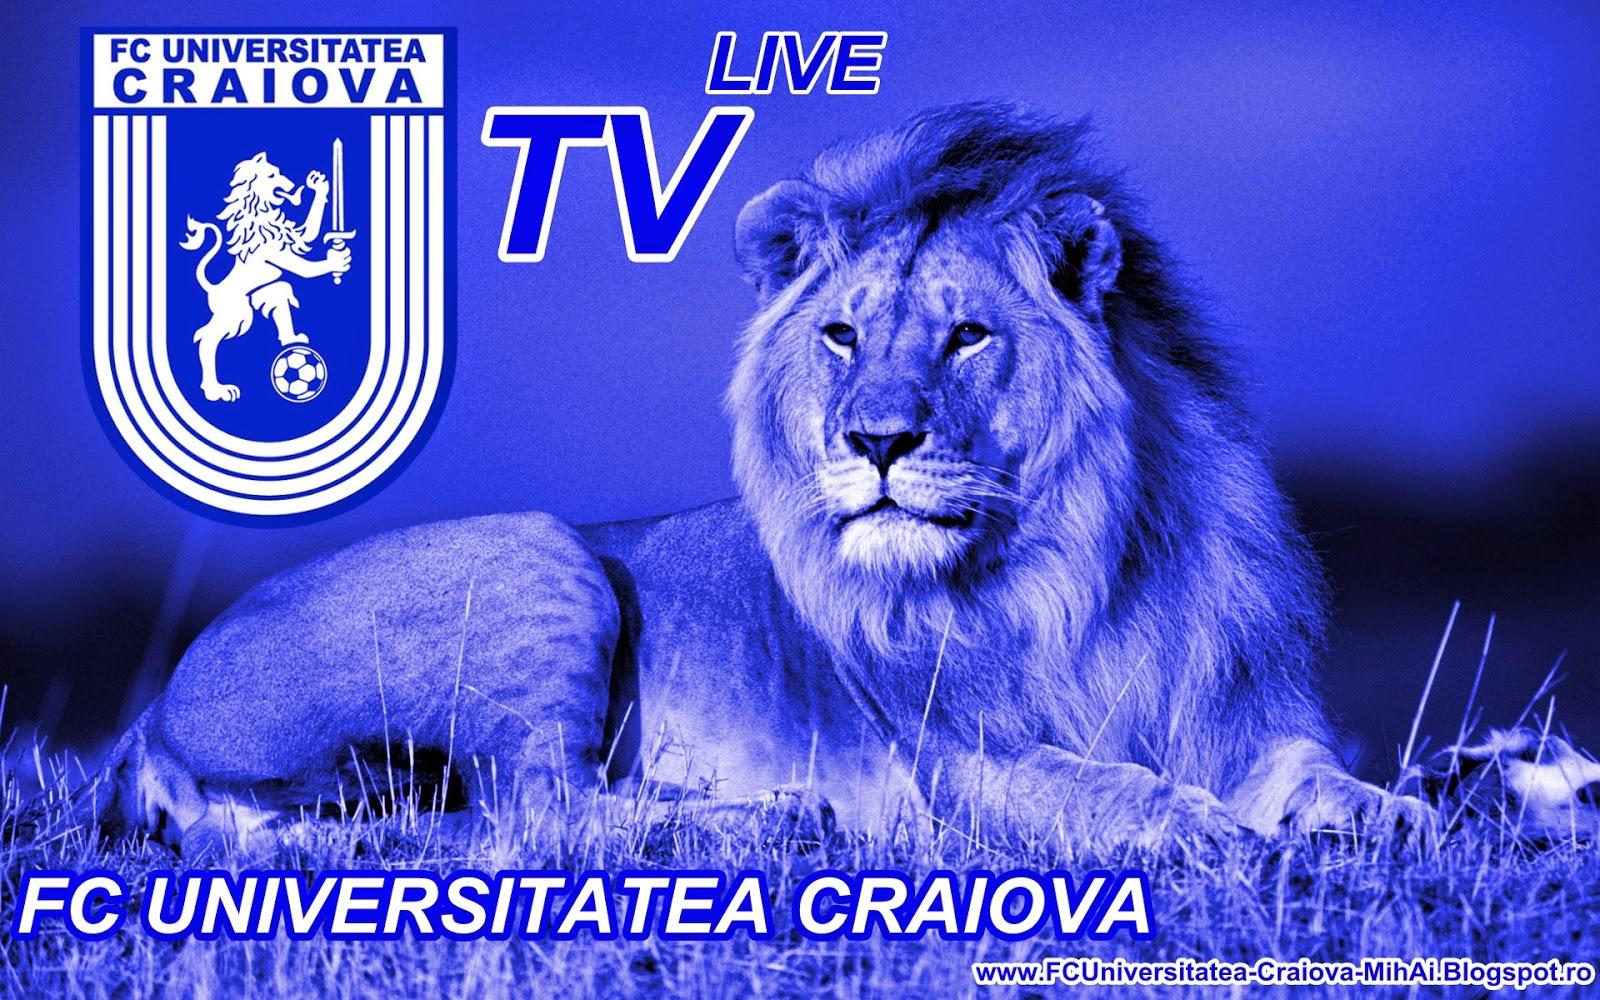 ❤ UNIVERSITATEA CRAIOVA TV